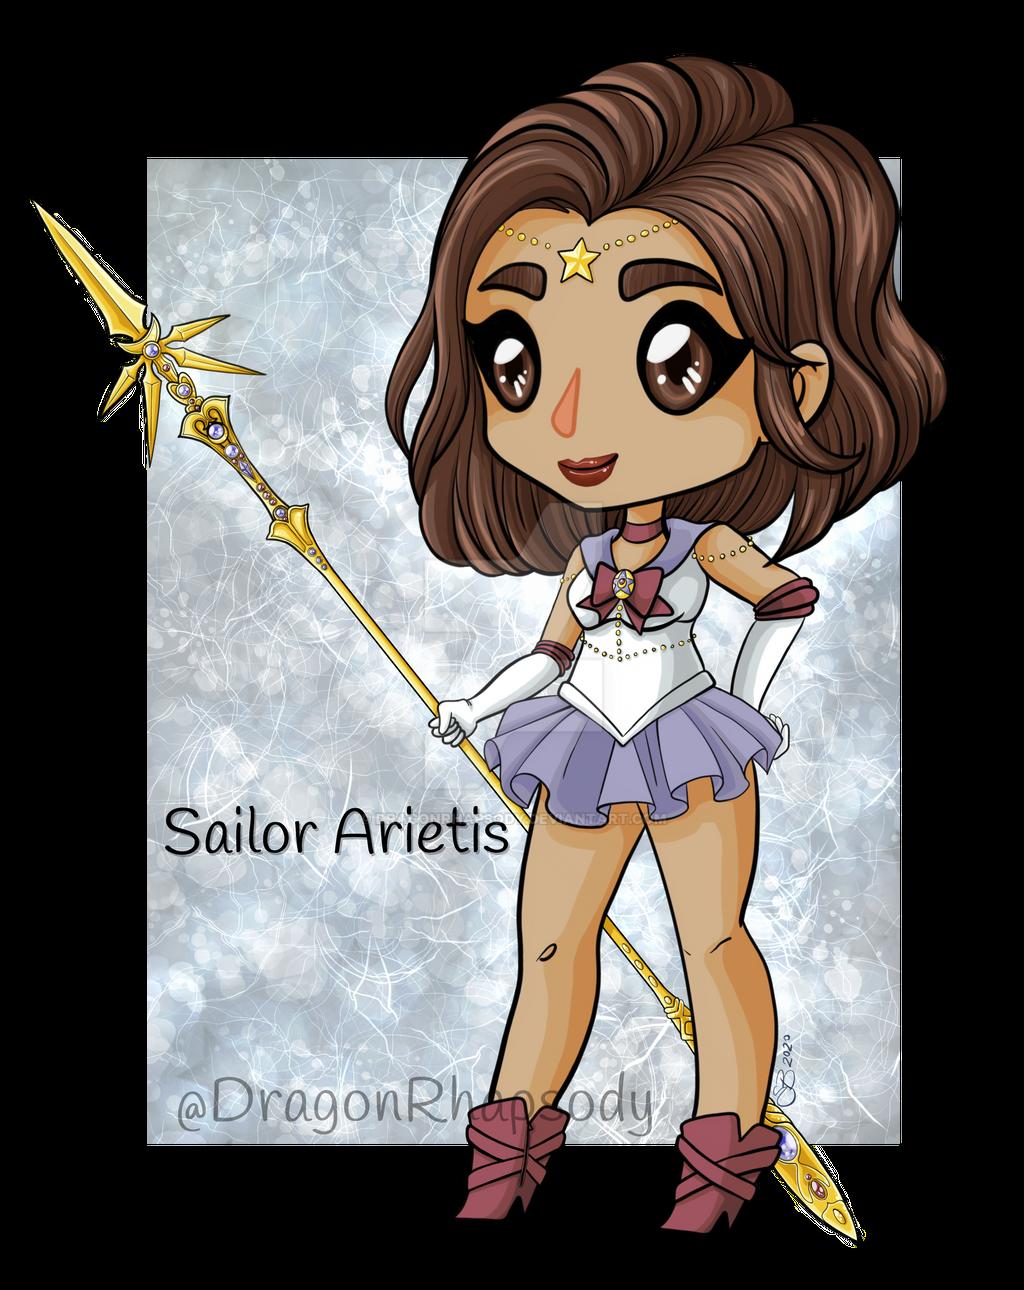 Sailor Arietis